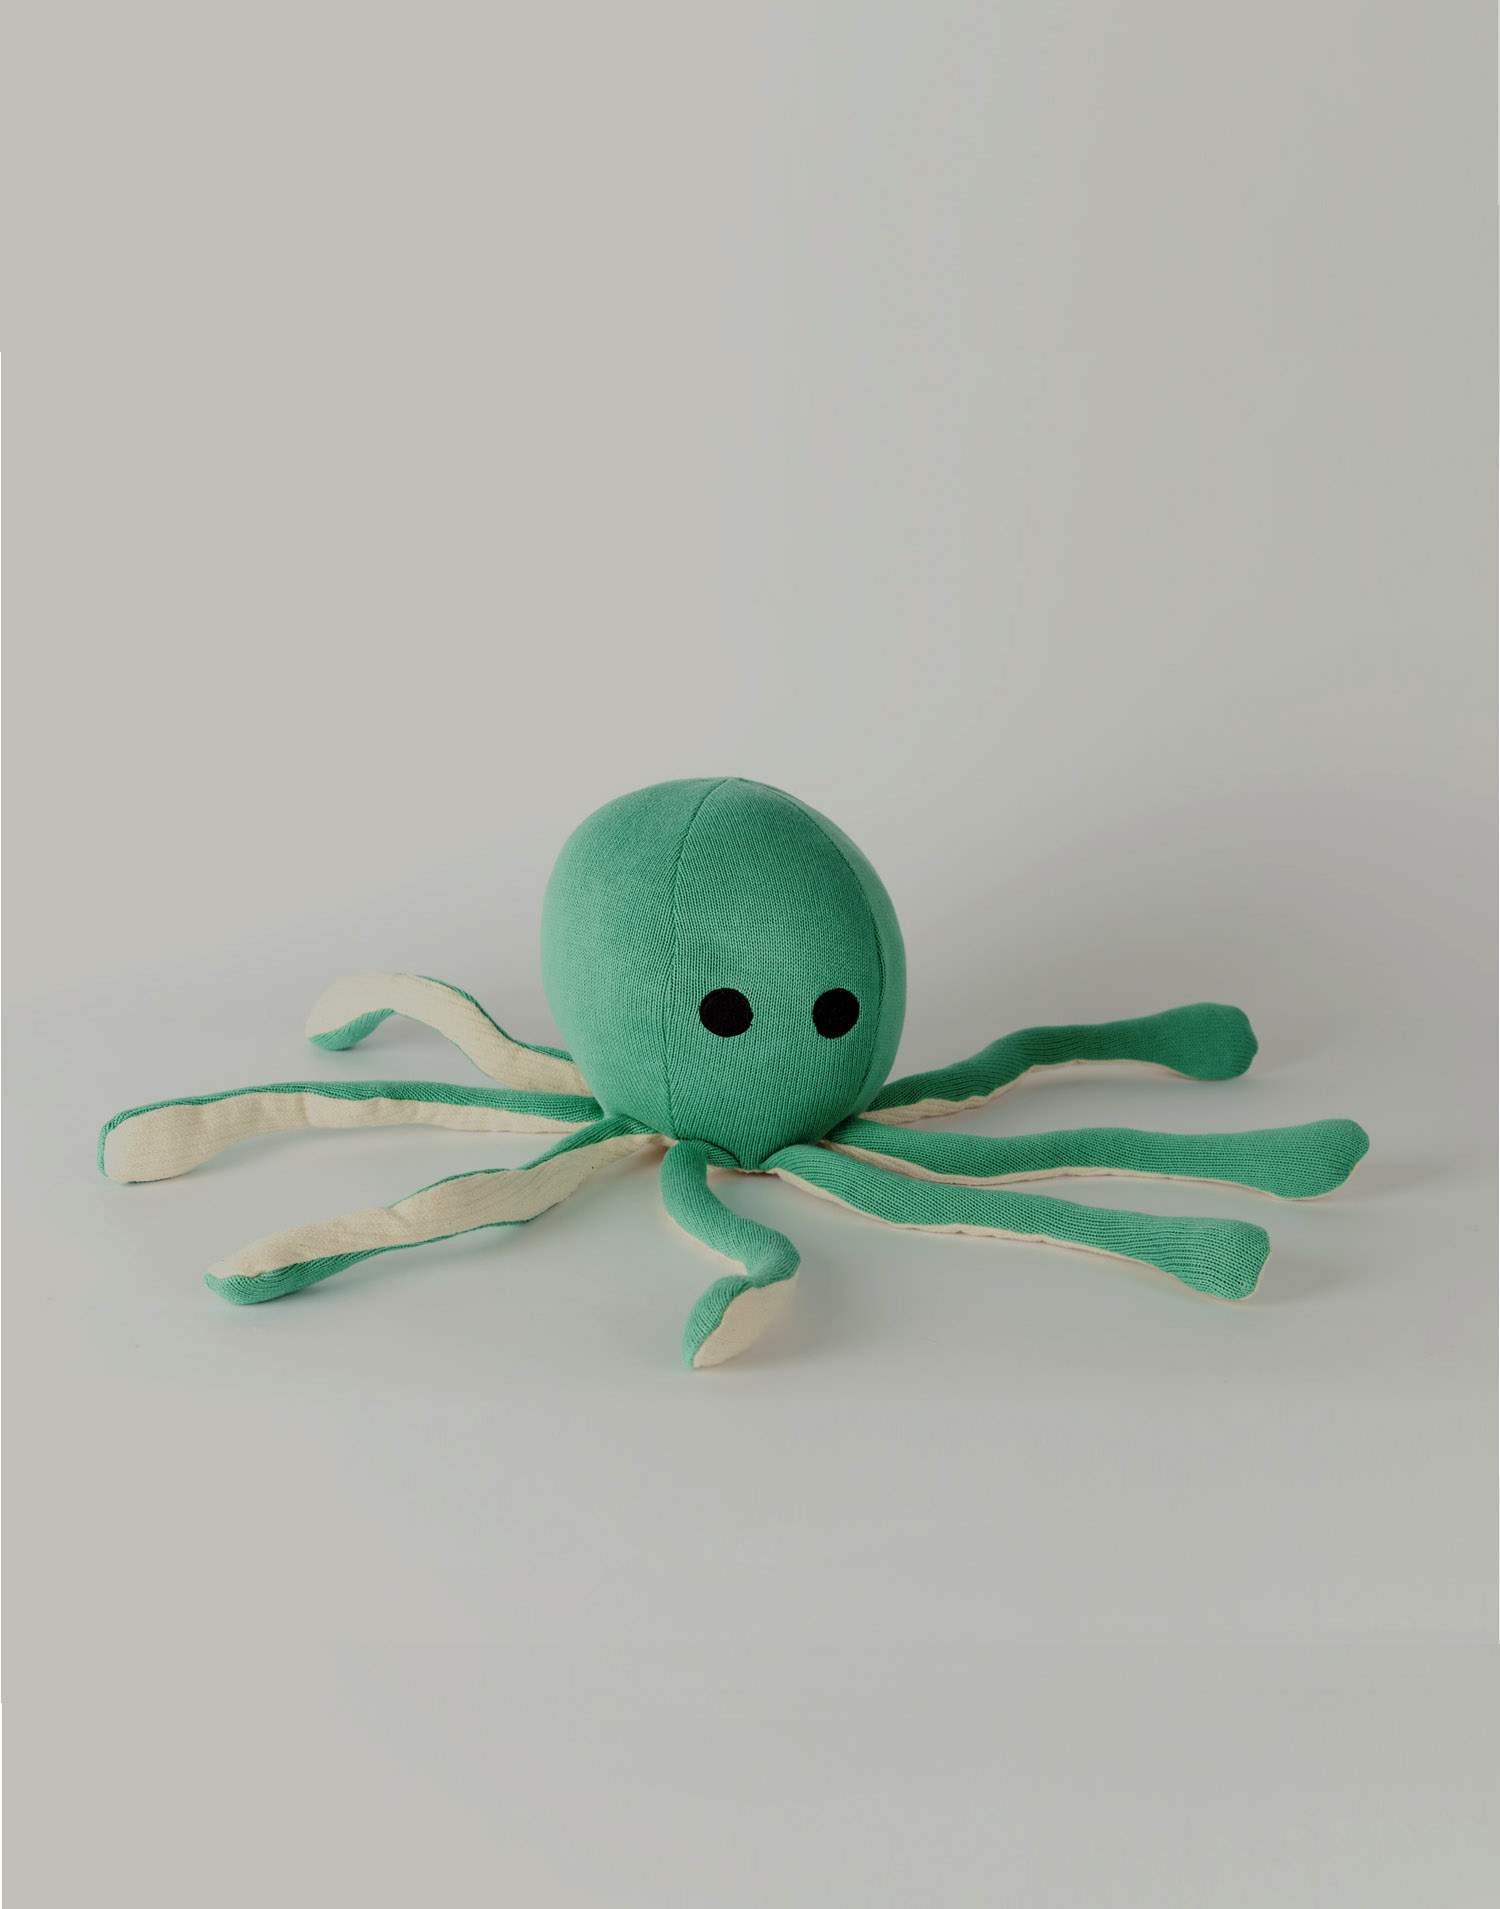 Octopus teddy